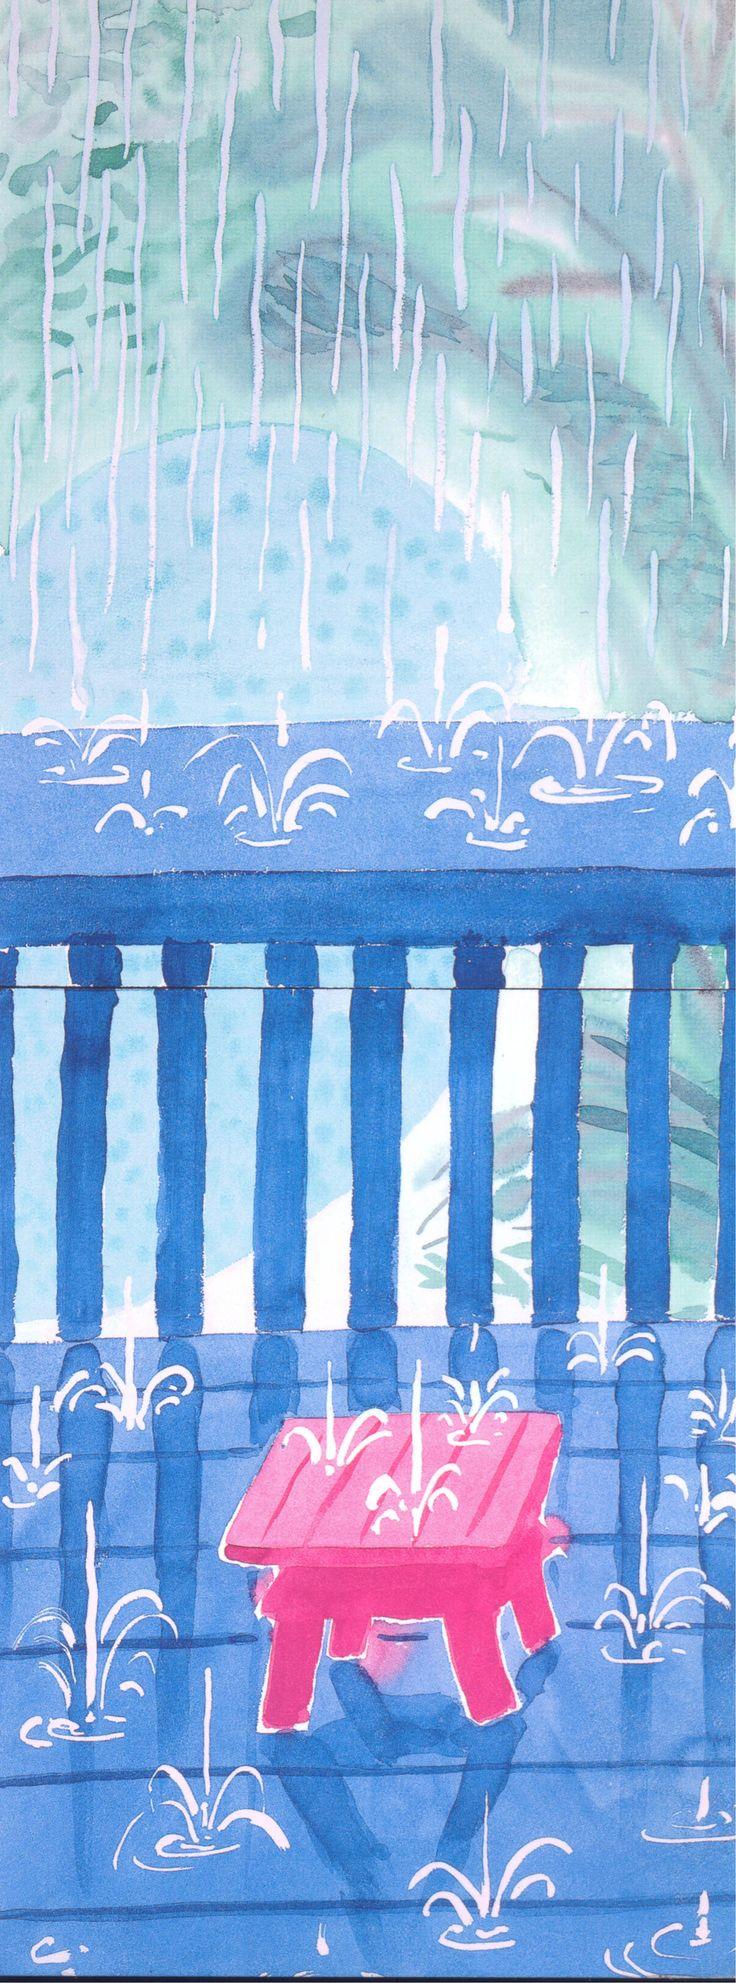 David Hockney | Saturday Rain ll | 2003